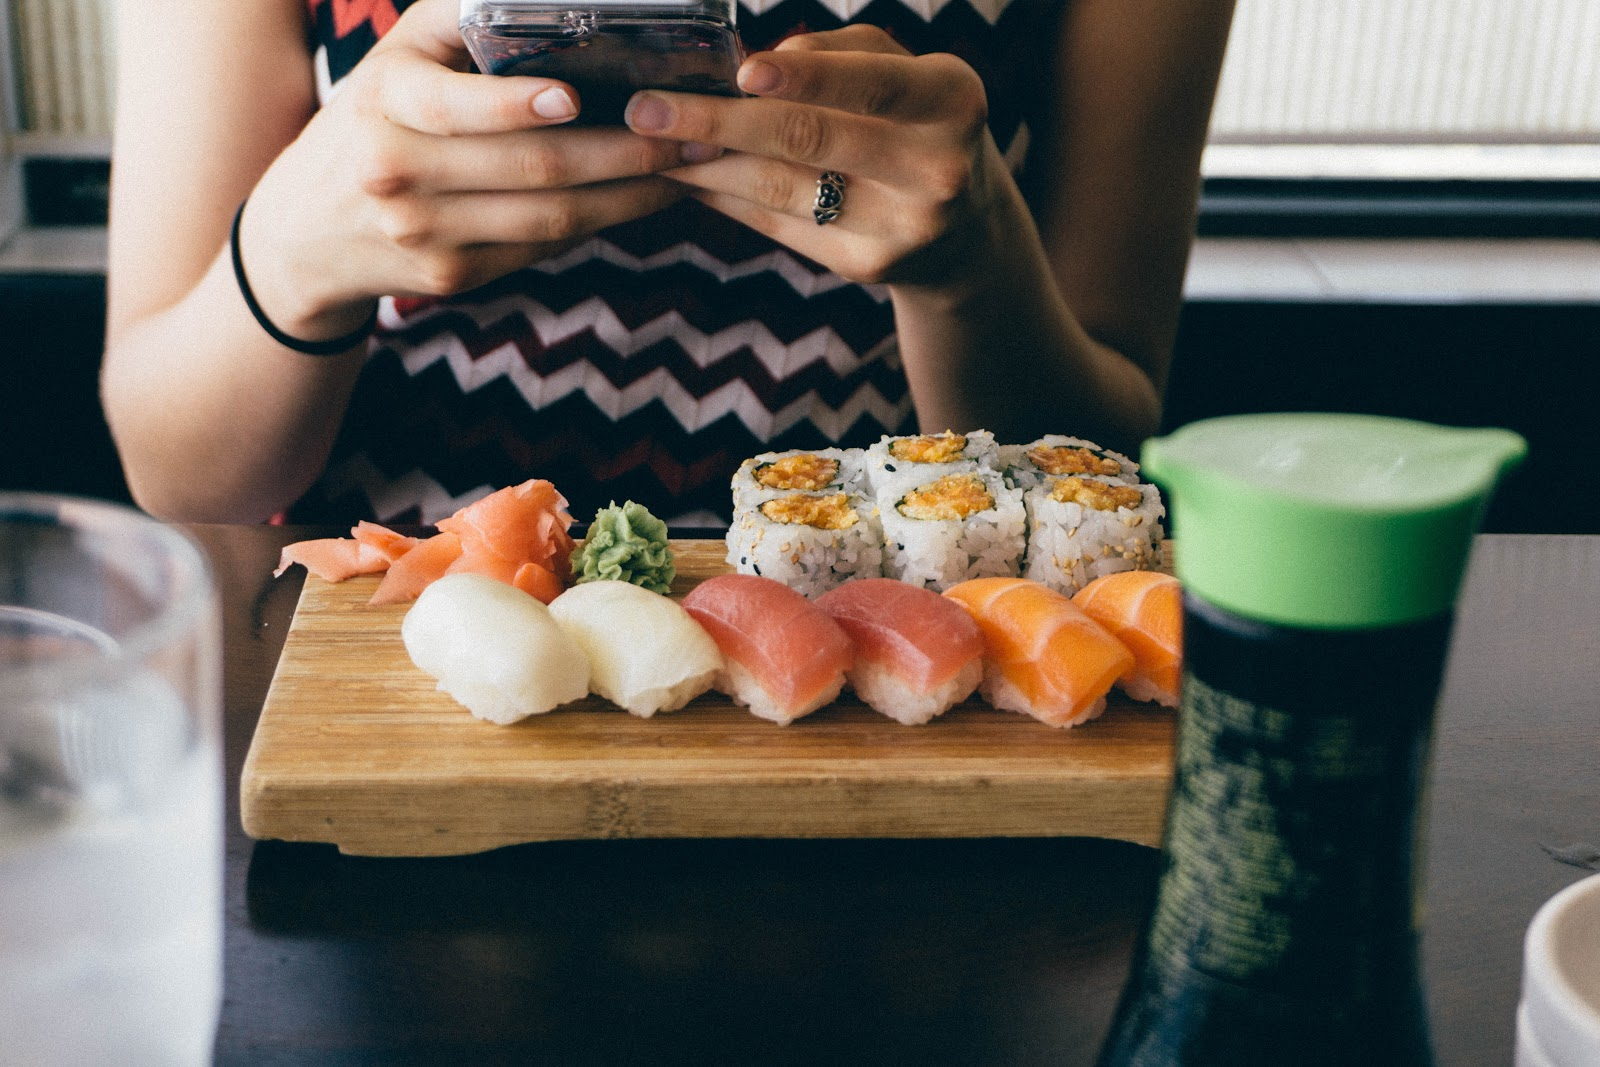 Restaurant customer eating sushi